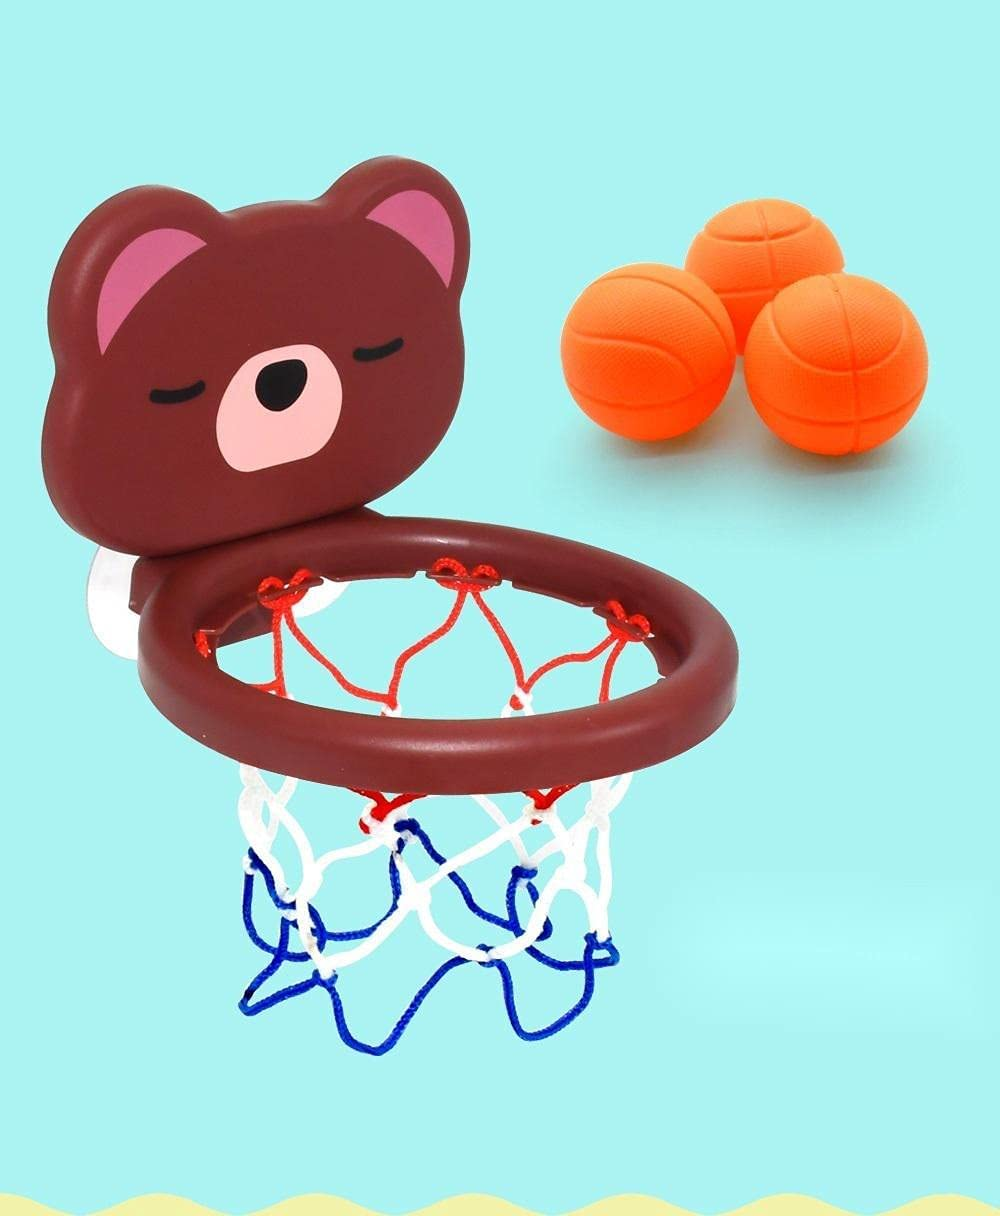 Soldering YOUMIYH Cute Baby Mini Shooting Popularity Bathtub Basketball 3 Bo Set Ball